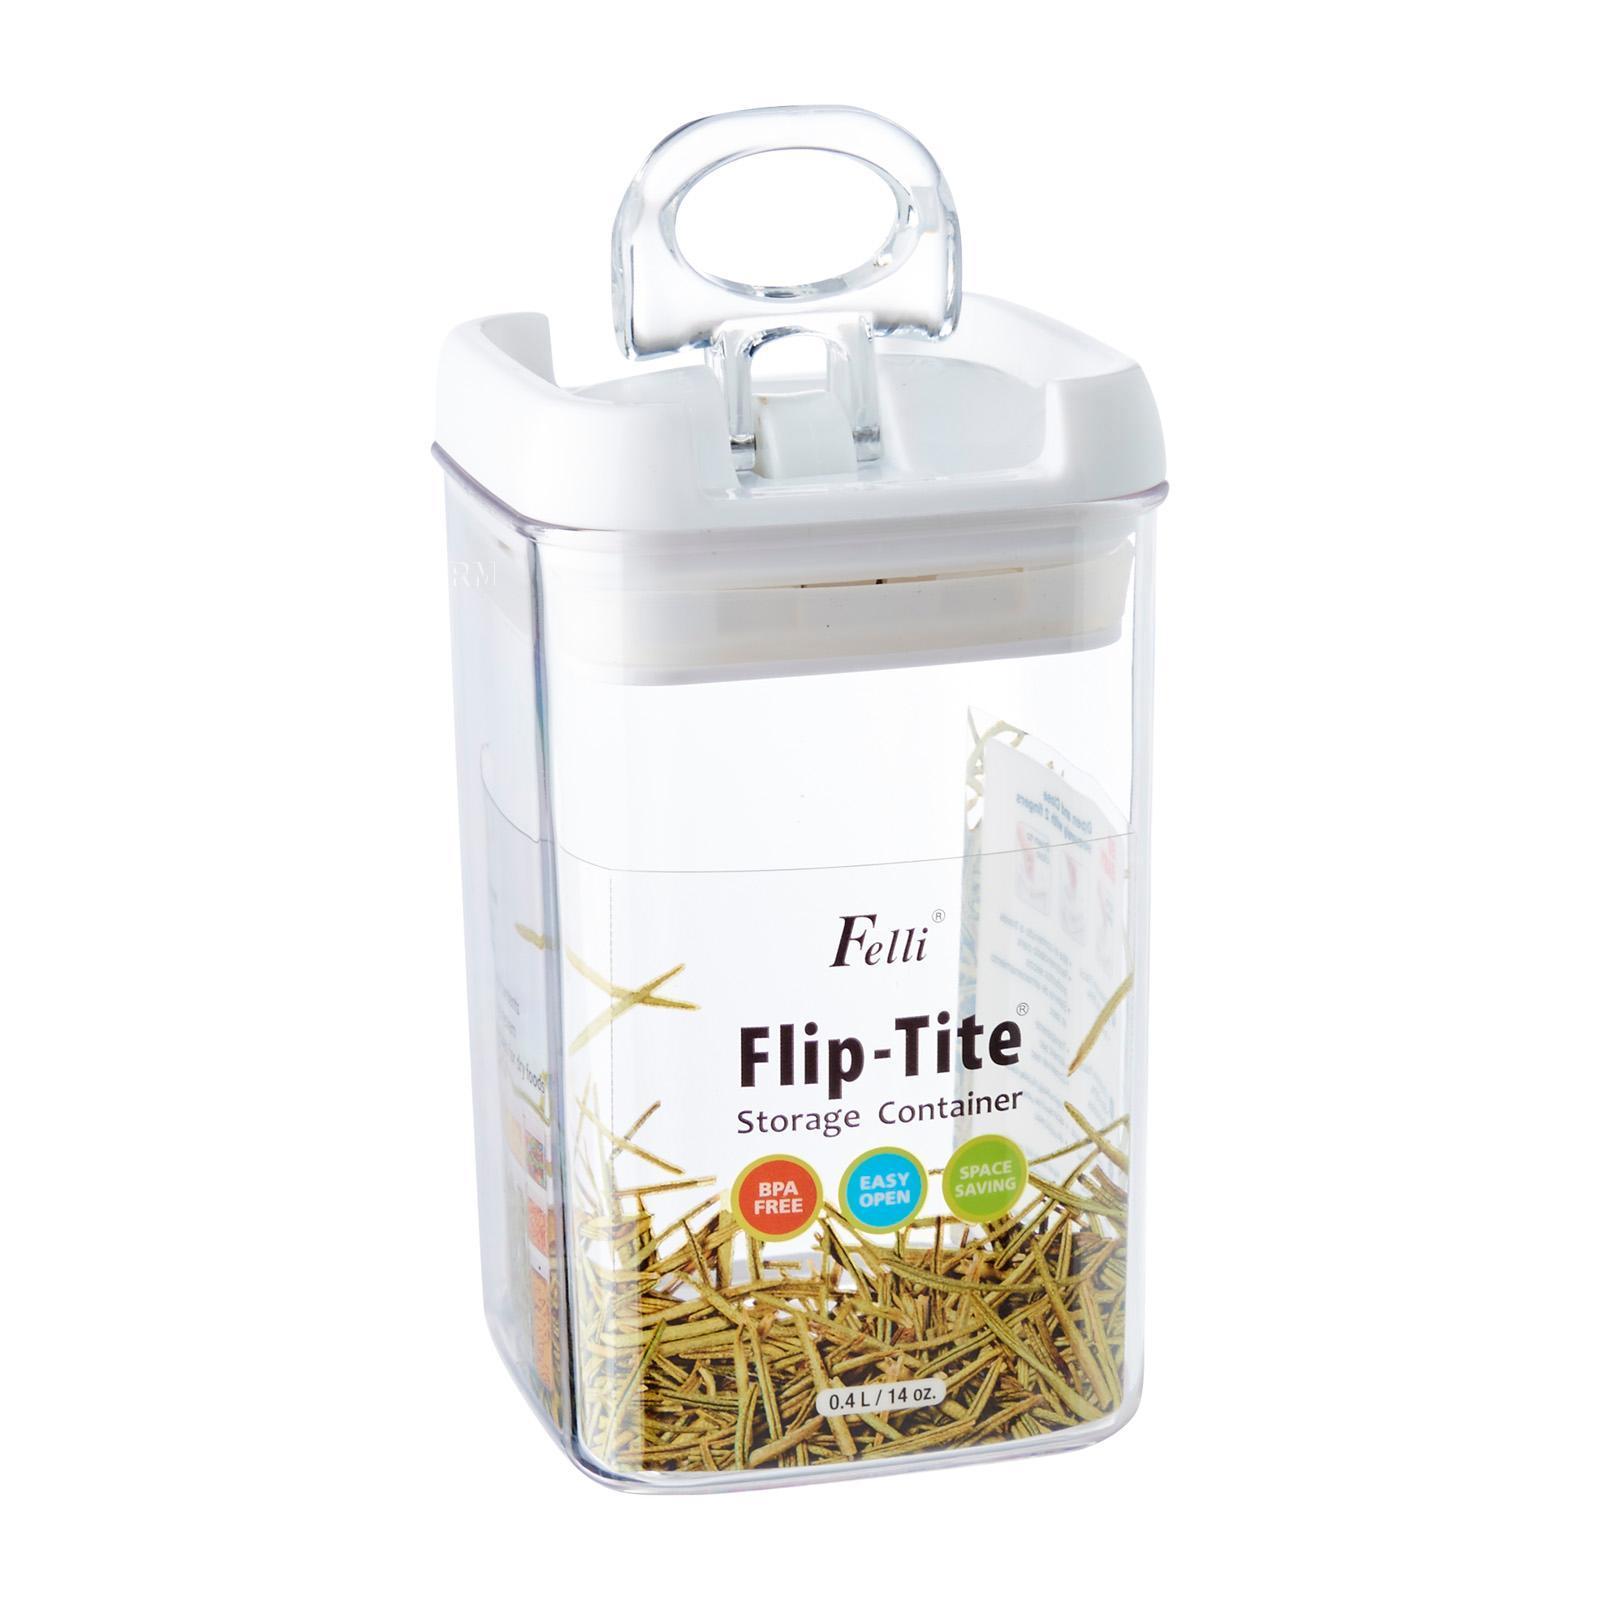 Felli Square Flip Tite Storage Container 0.4 L